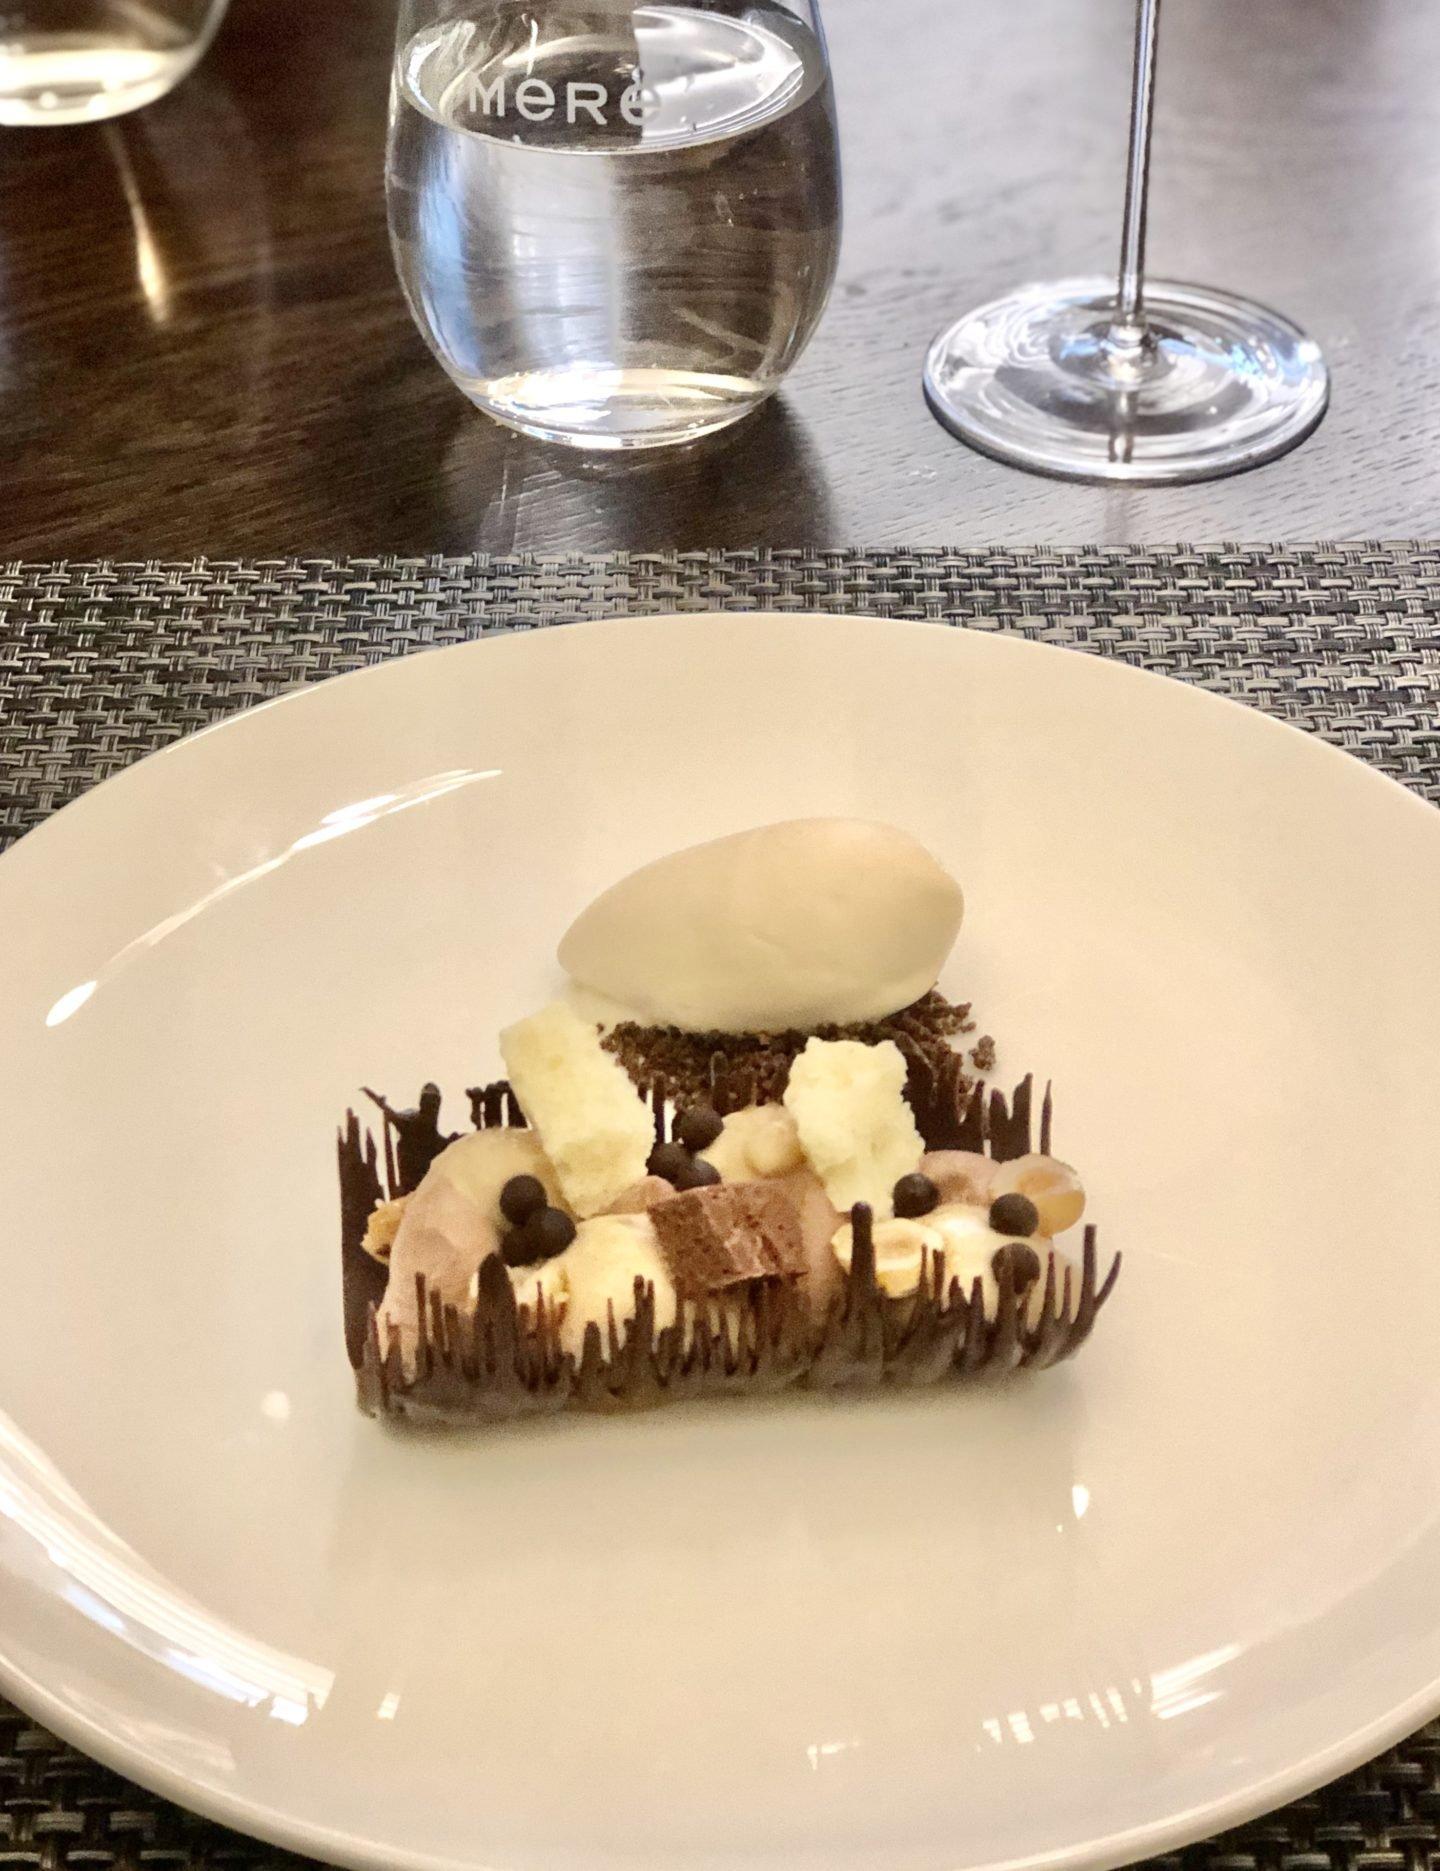 Chocolate and Hazelnut dessert at the Mere